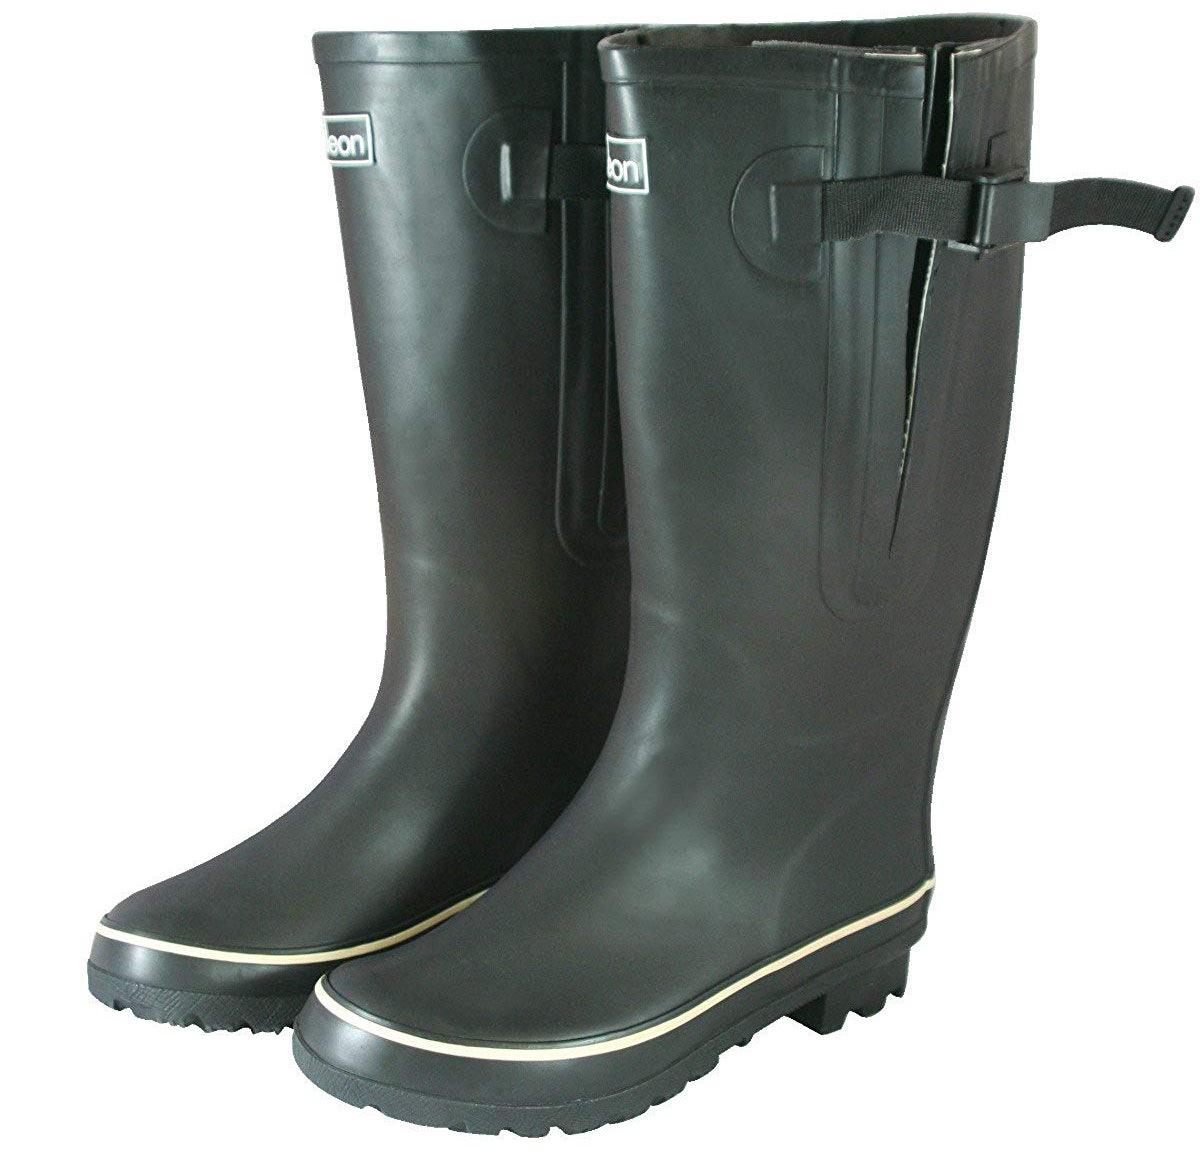 Jileon Extra-Wide Rubber Rain Boots